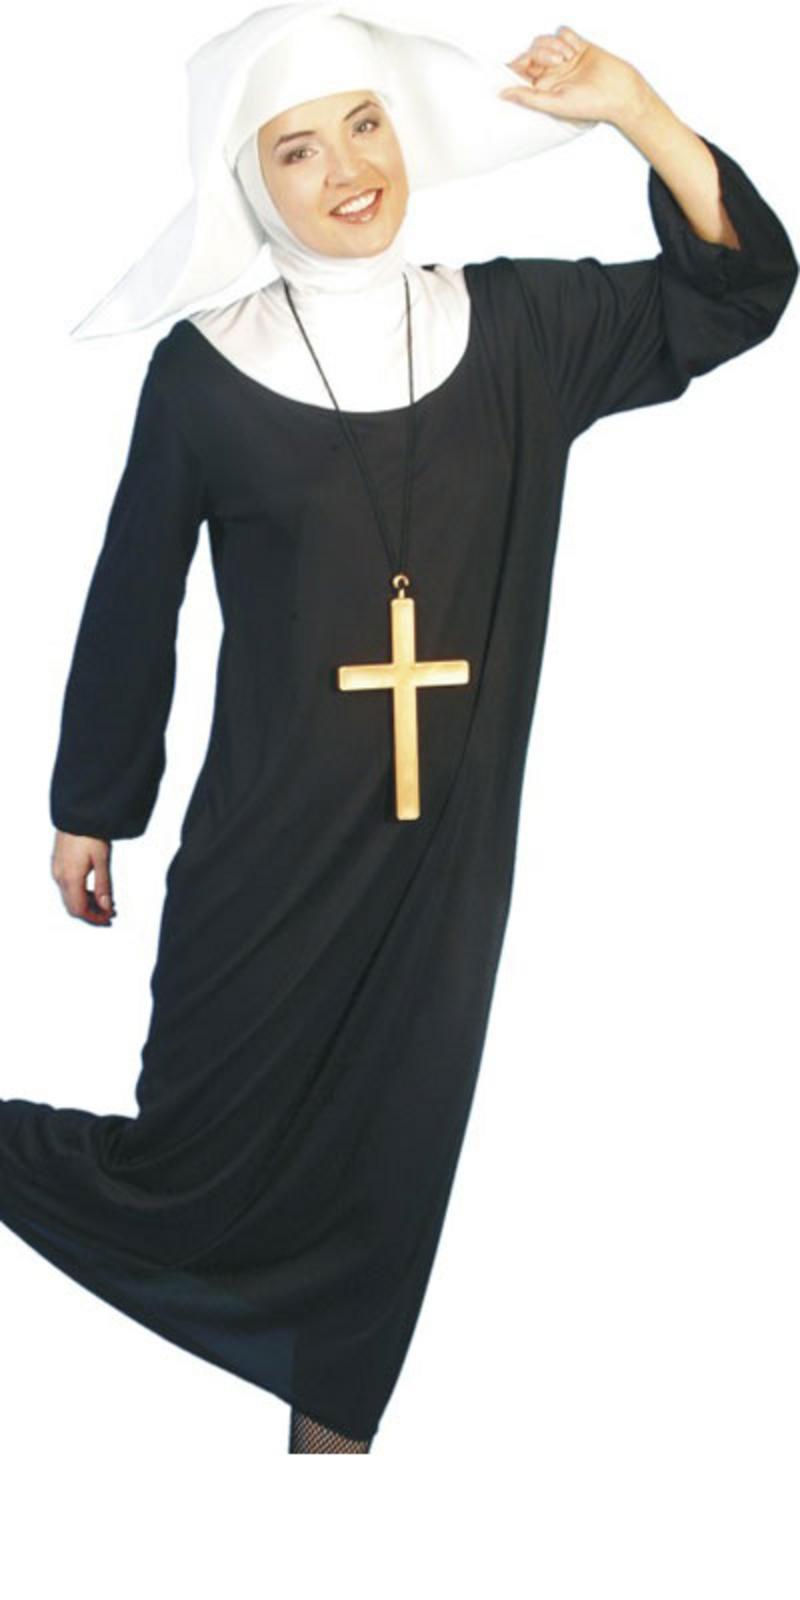 Saints Sinners Sound of Music Nun Fancy Dress Costume